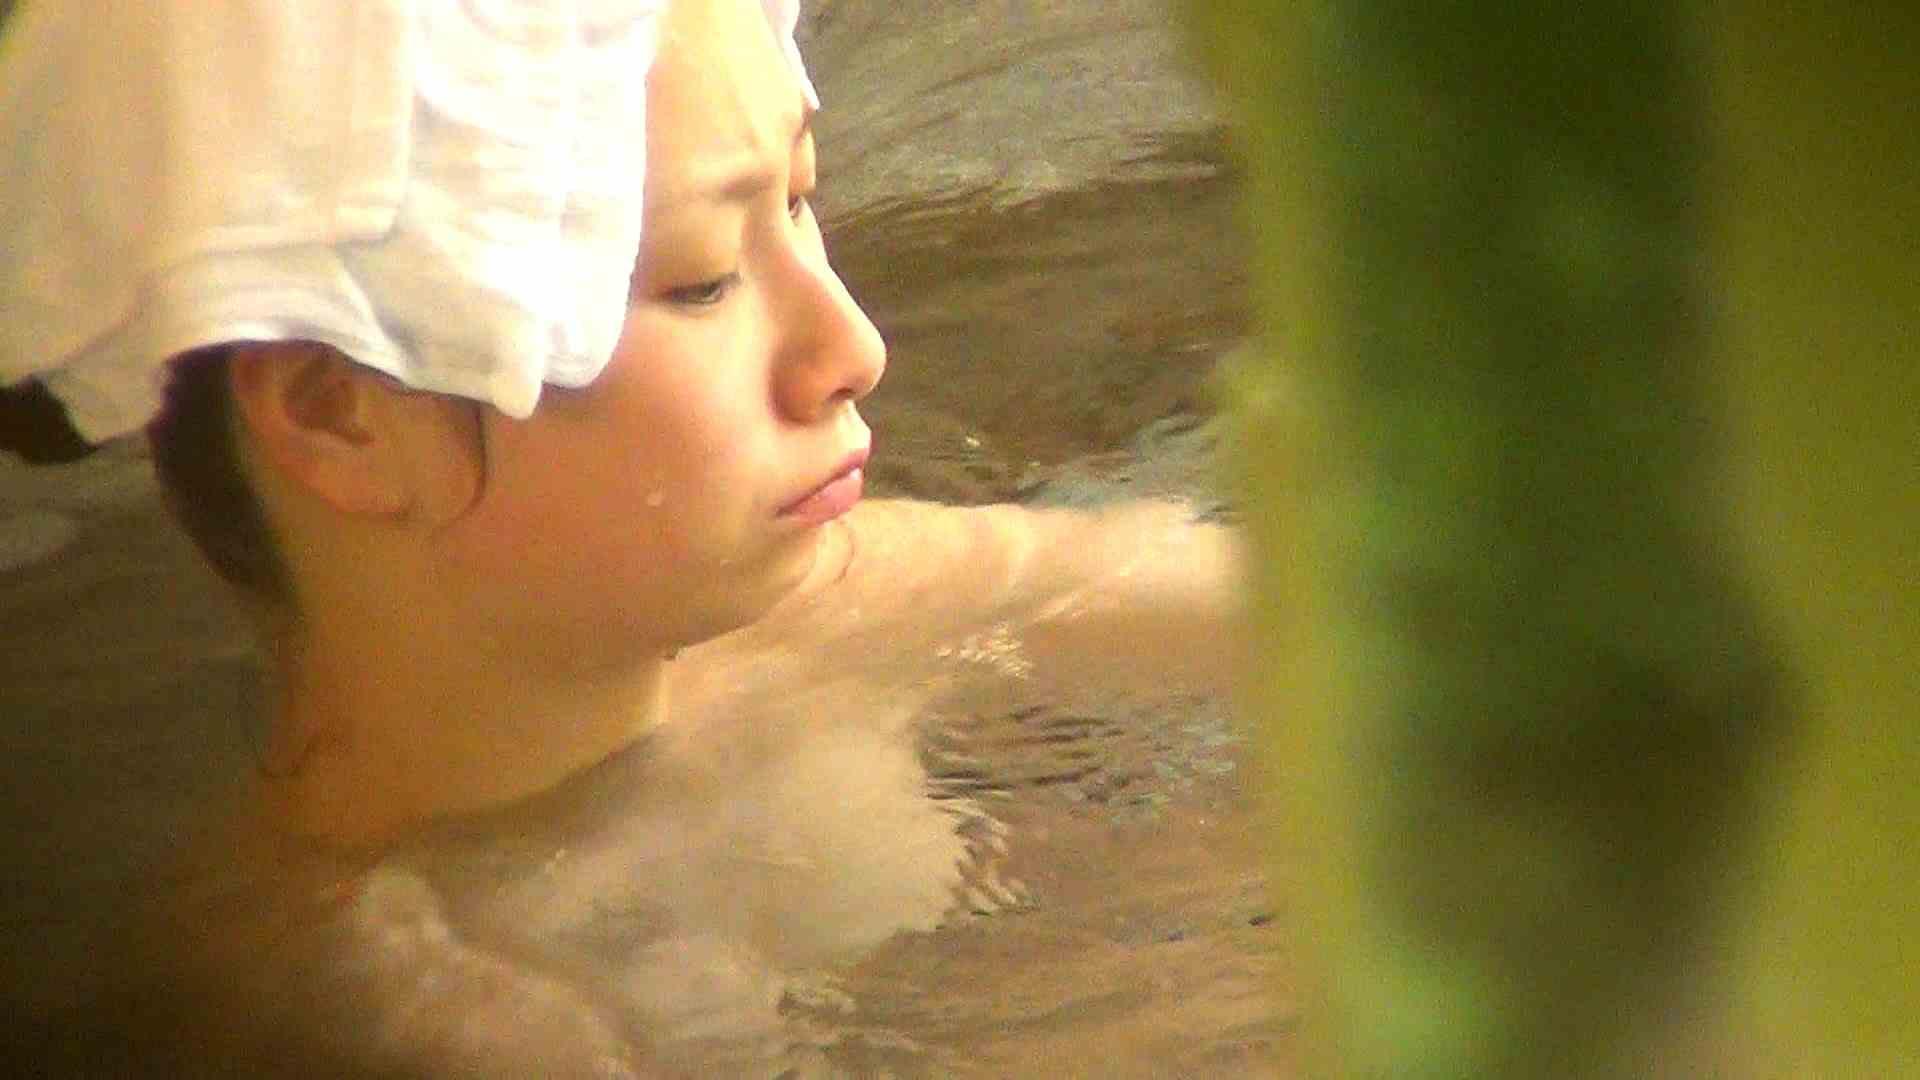 Vol.36 不機嫌な桃色美女 潜伏露天風呂 覗きワレメ動画紹介 80pic 56